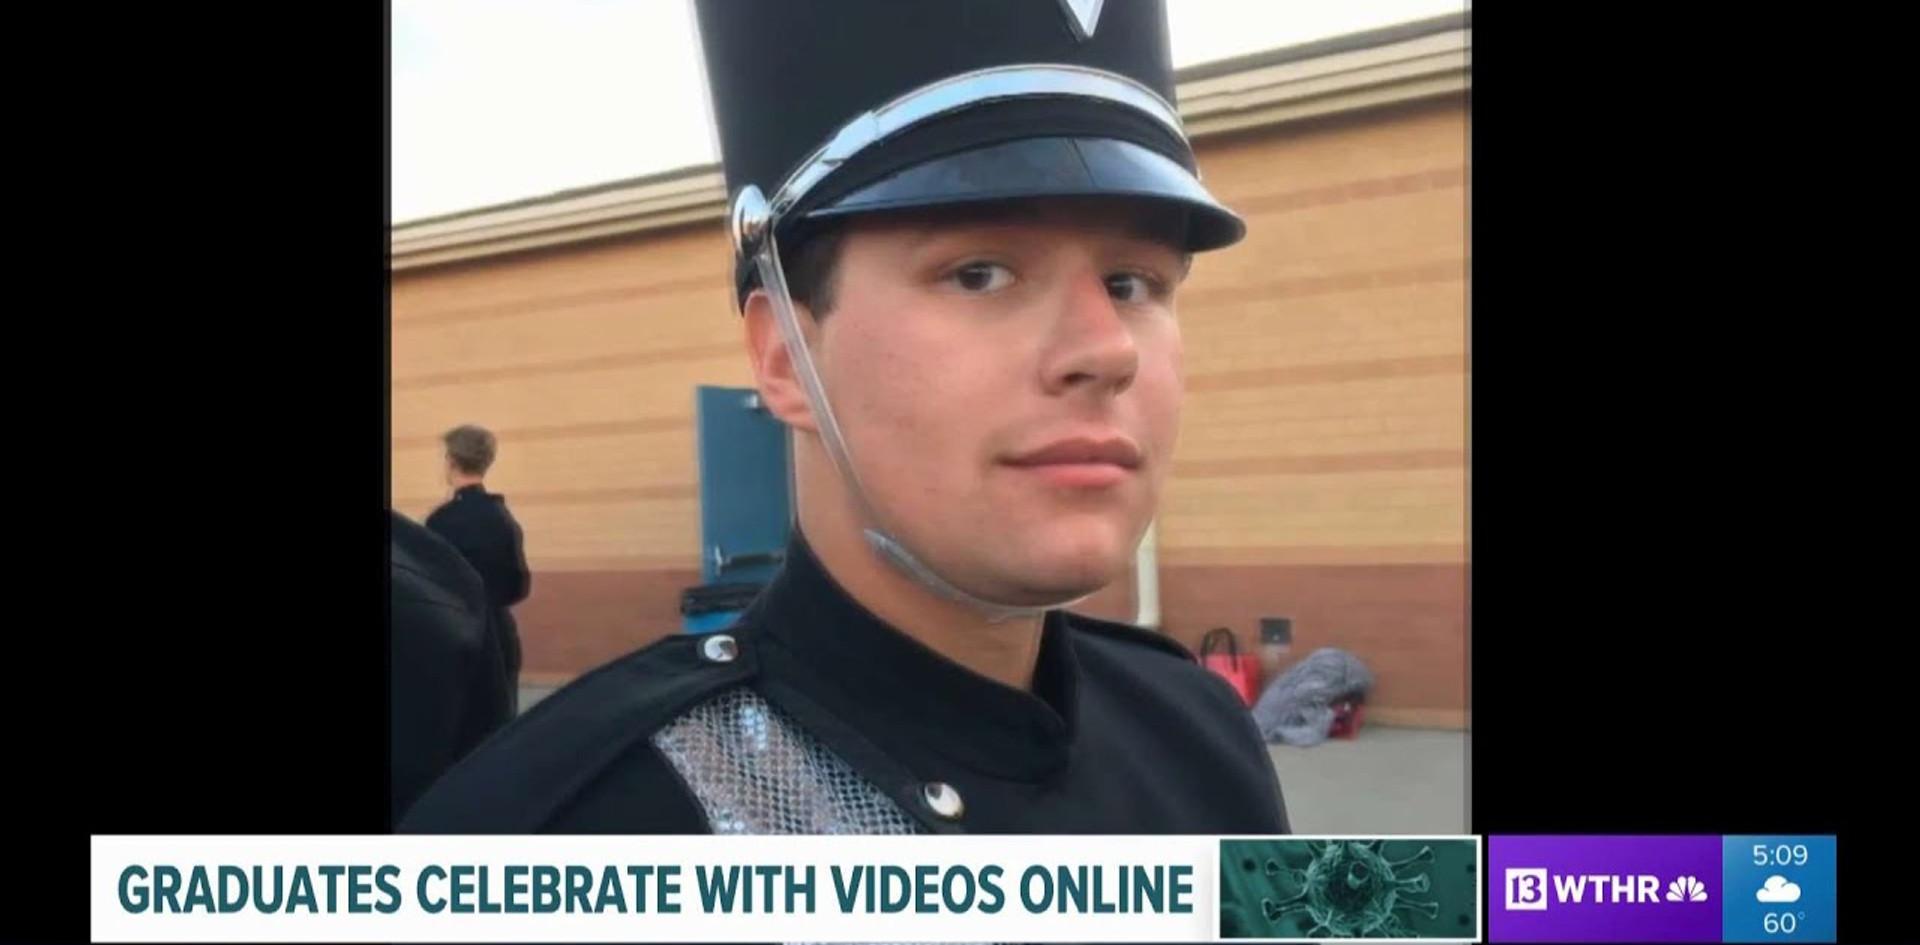 Graduation Video News Story